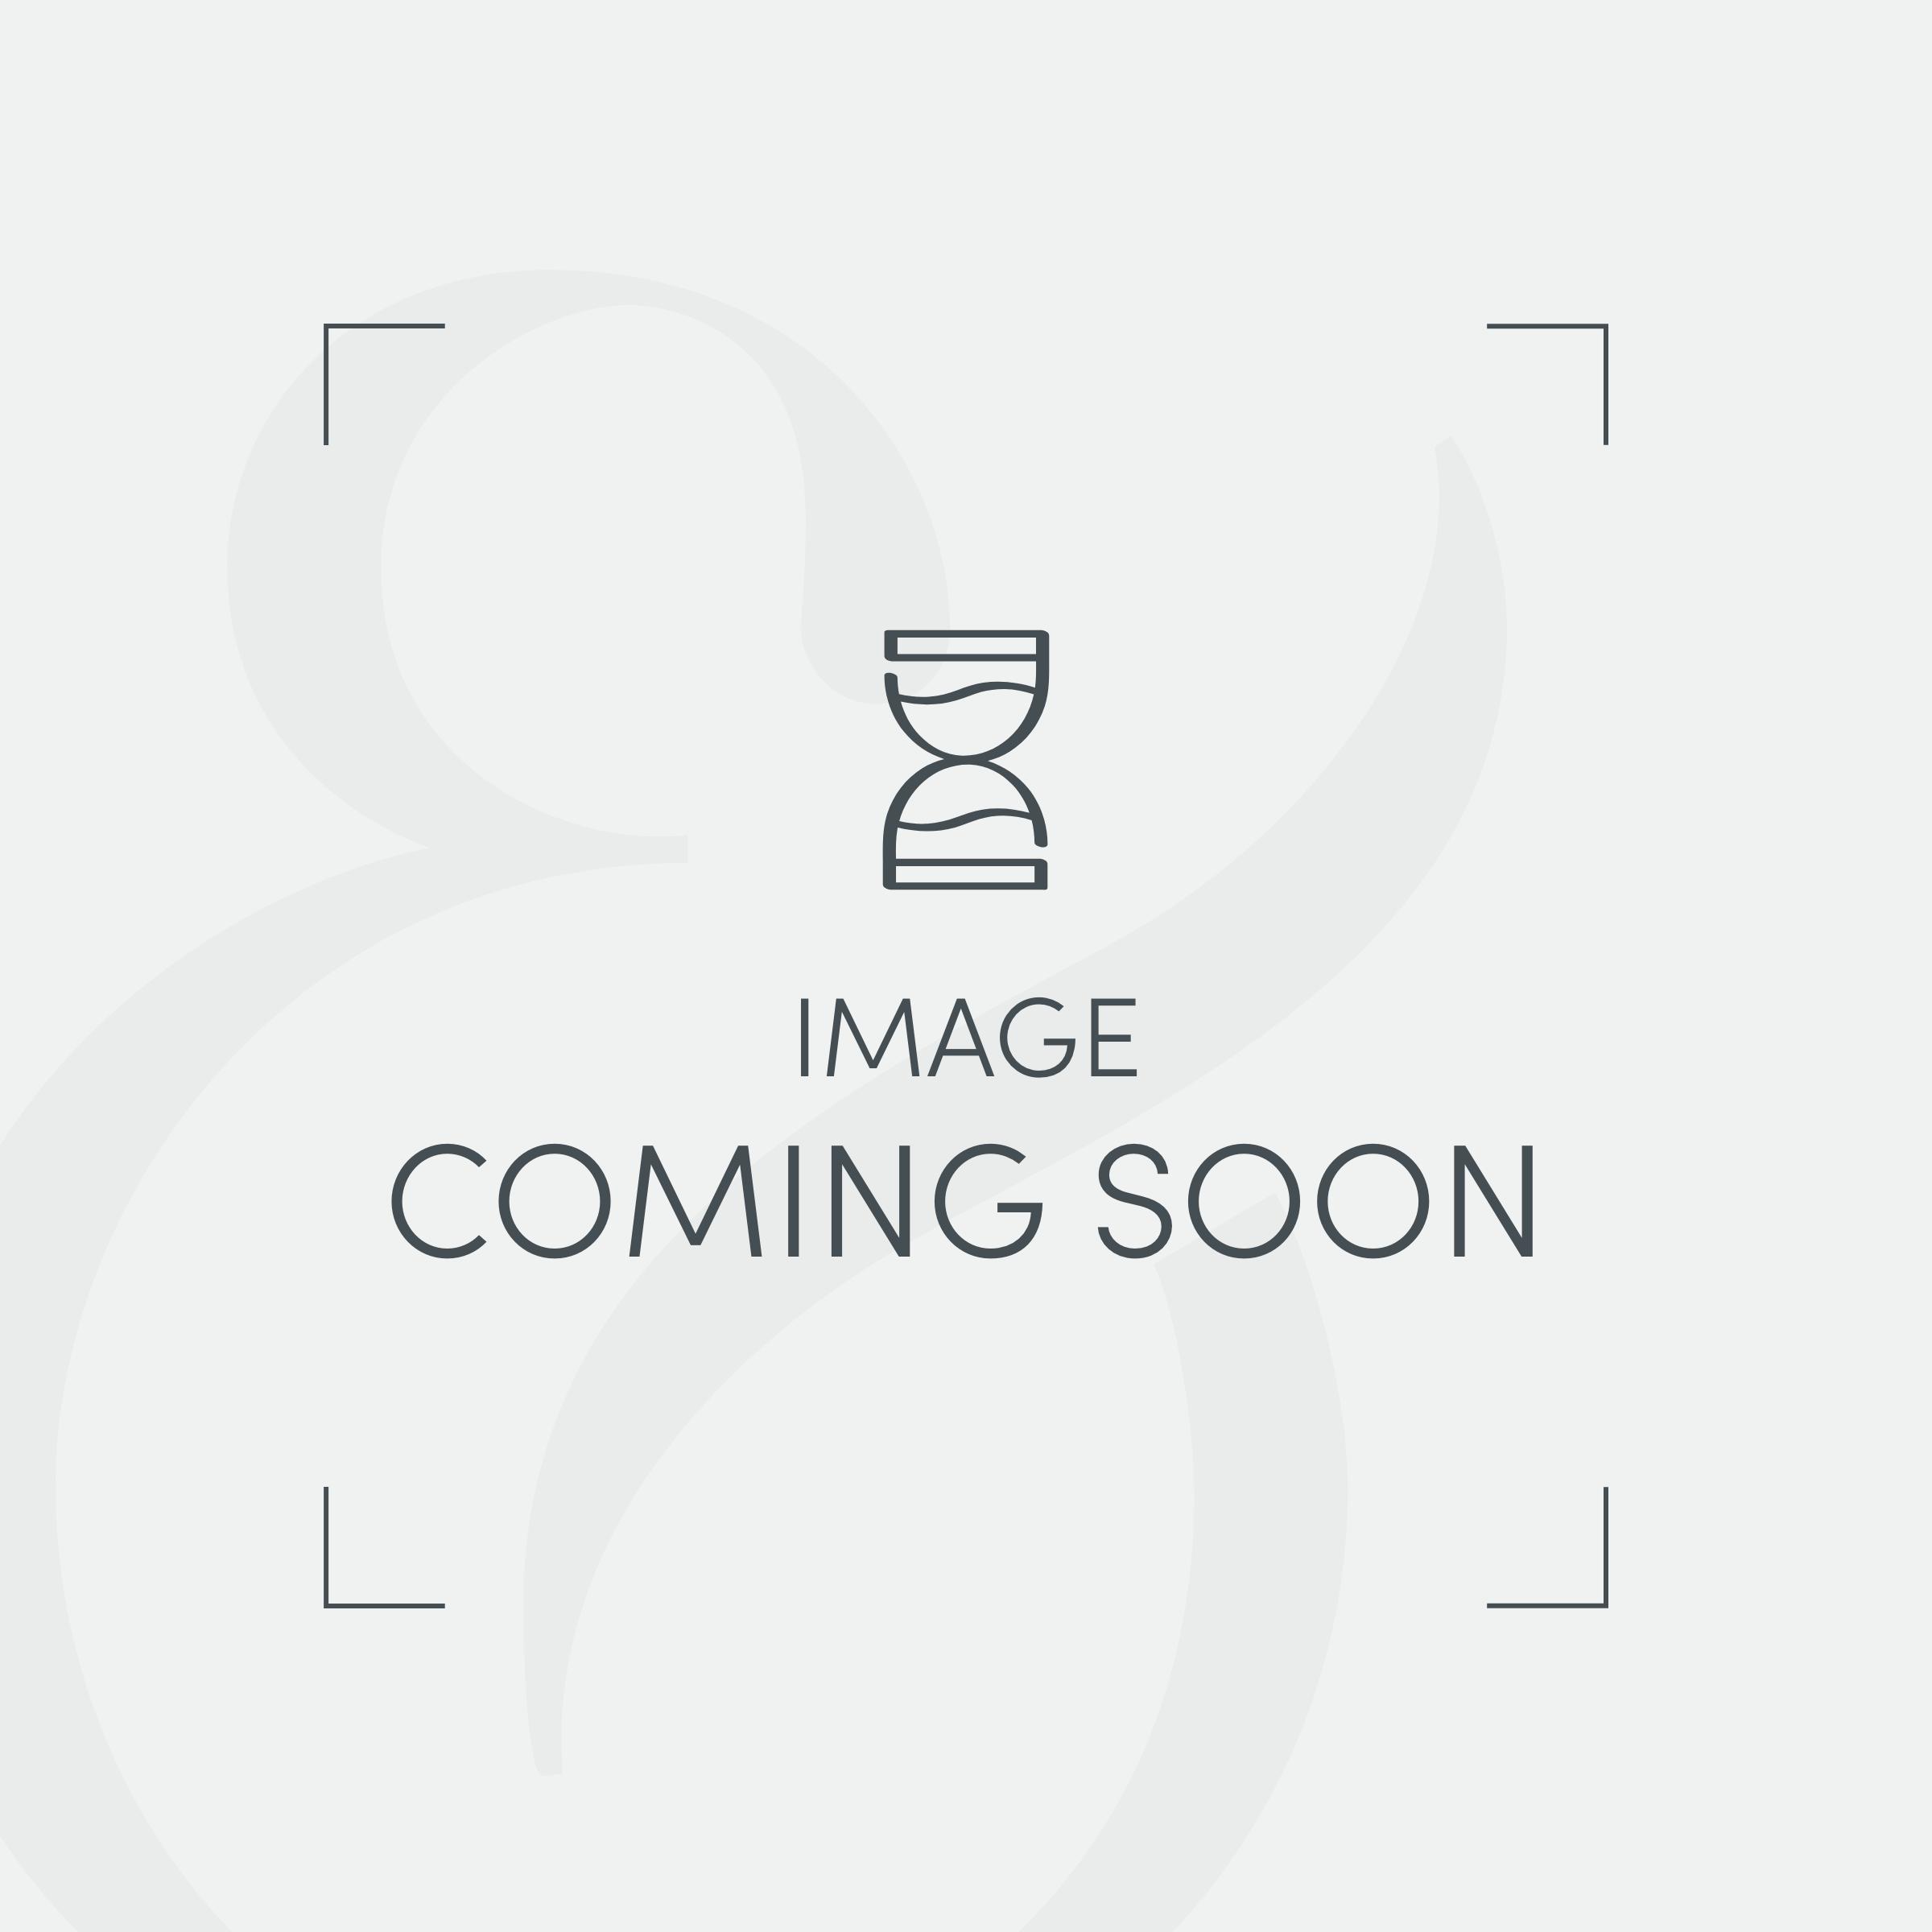 Luxury Egyptian 600TC Cotton Bundle - Soft Cream - Double - Duvet Cover, Deep Fitted Sheet, Standard Oxford Pillowcase Pair